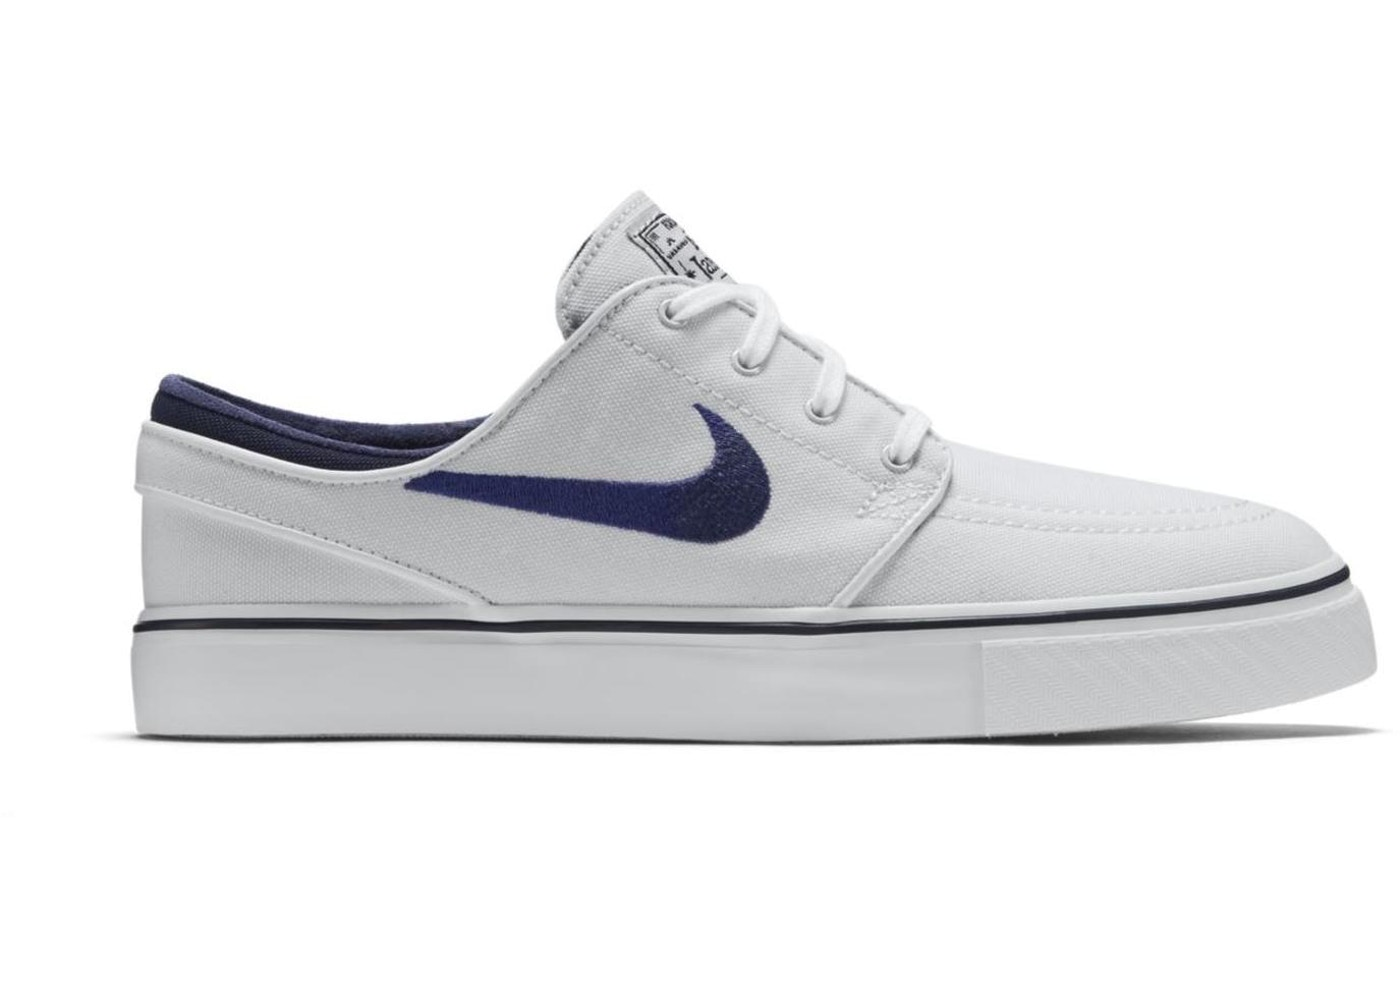 Nacarado Mojado Ocurrencia  Nike SB Stefan Janoski Zoom Canvas Summit White - 615957-104